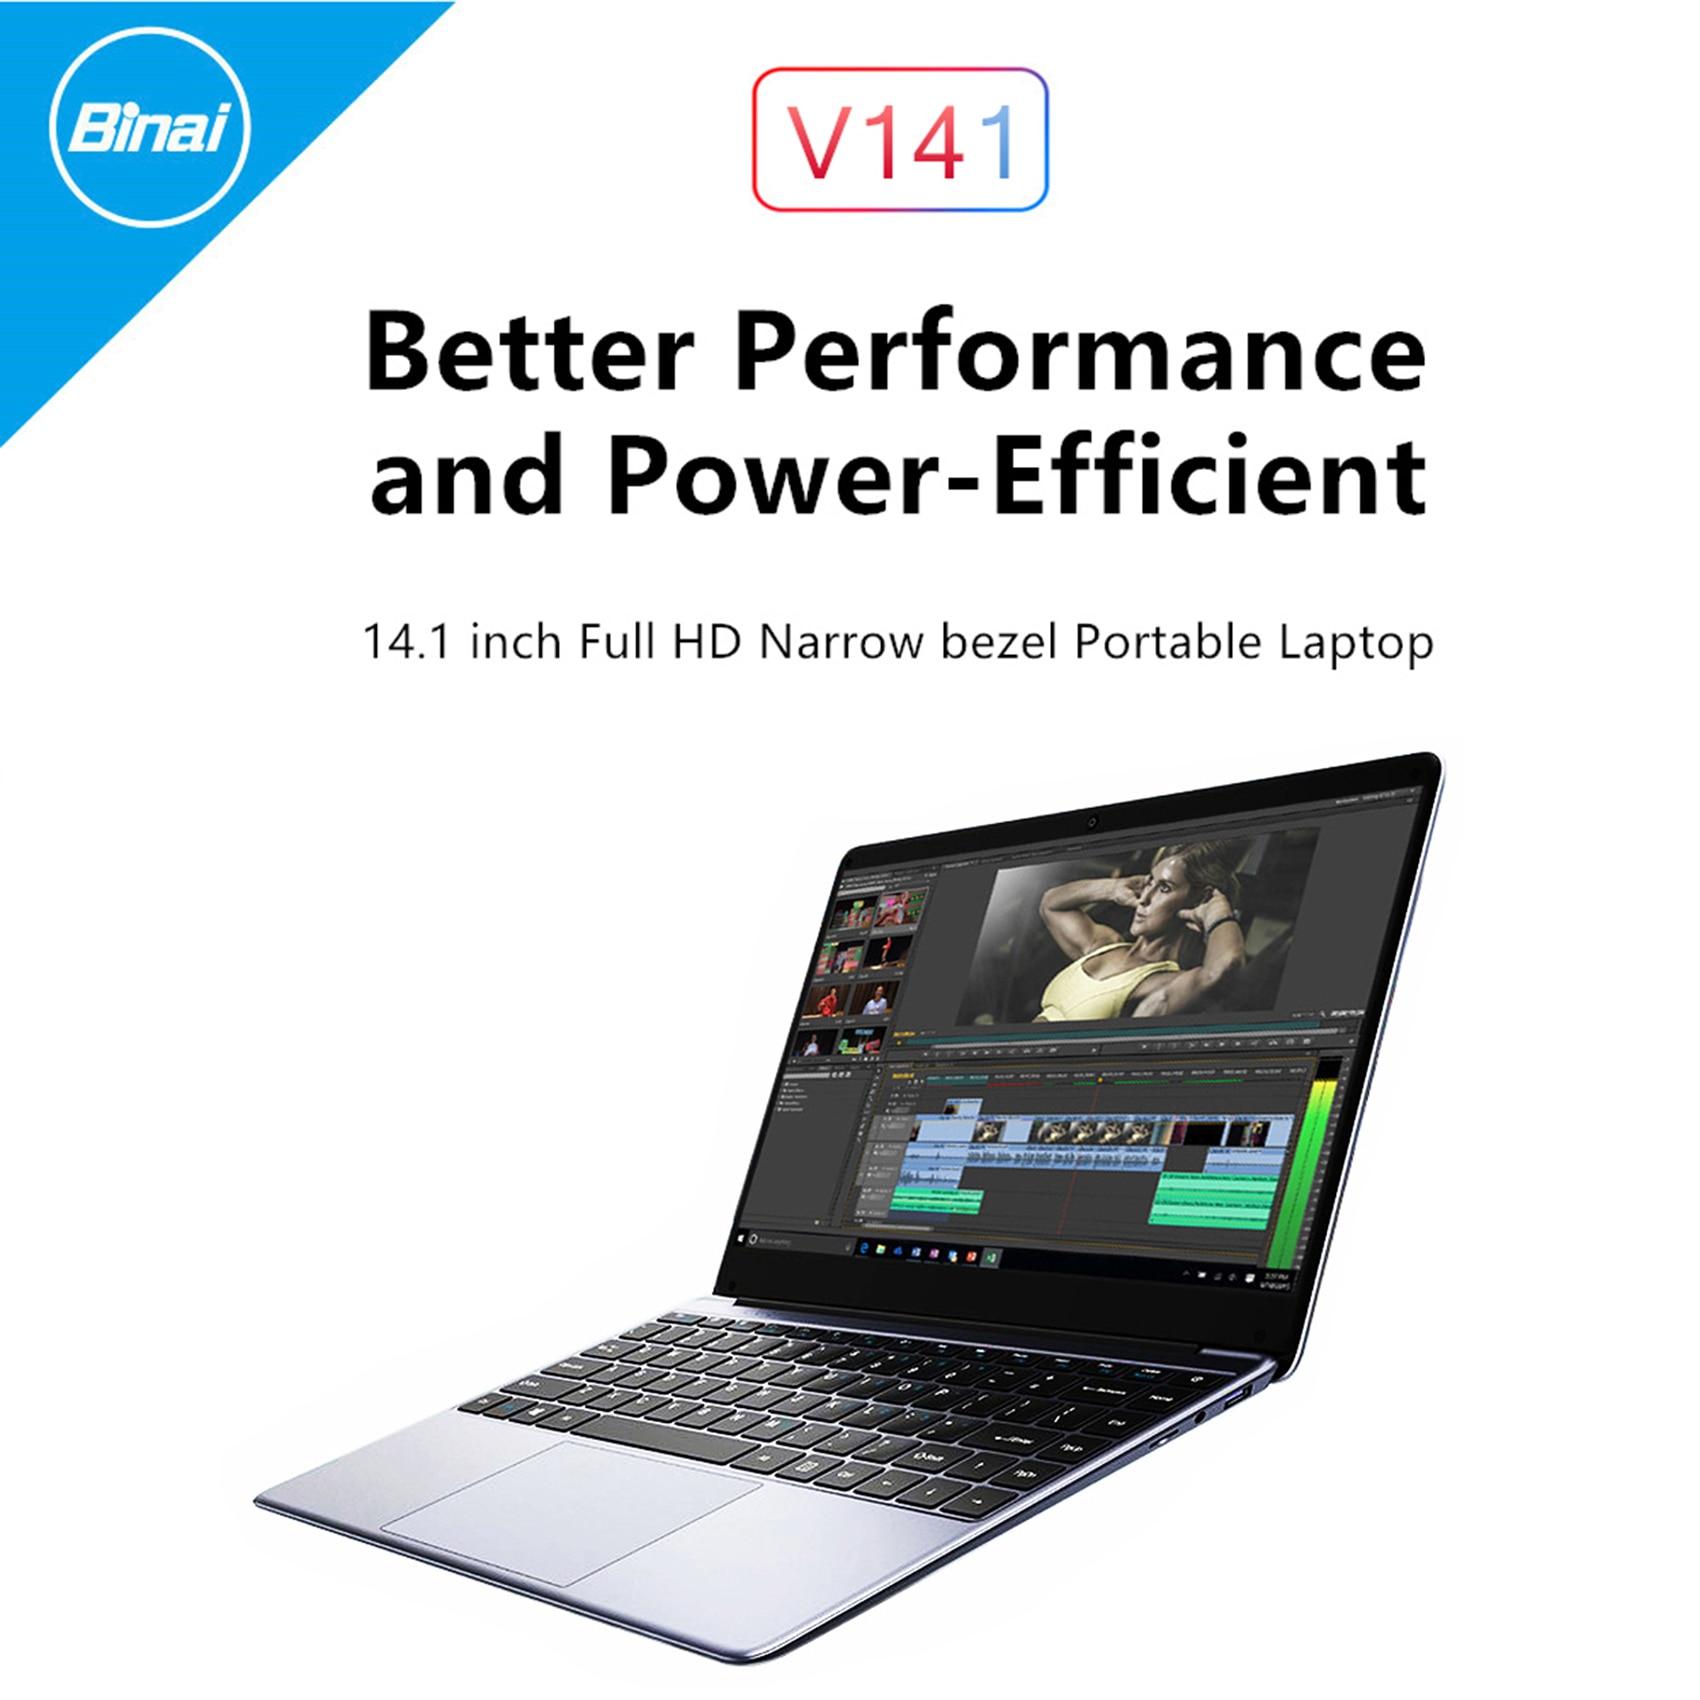 Binai V141 حاسوب محمول 14.1 بوصة J3455 8GB + 128GB 1920x1080 Win10 2.4G/5GHz BT4.2 حاسوب محمول للمكتب